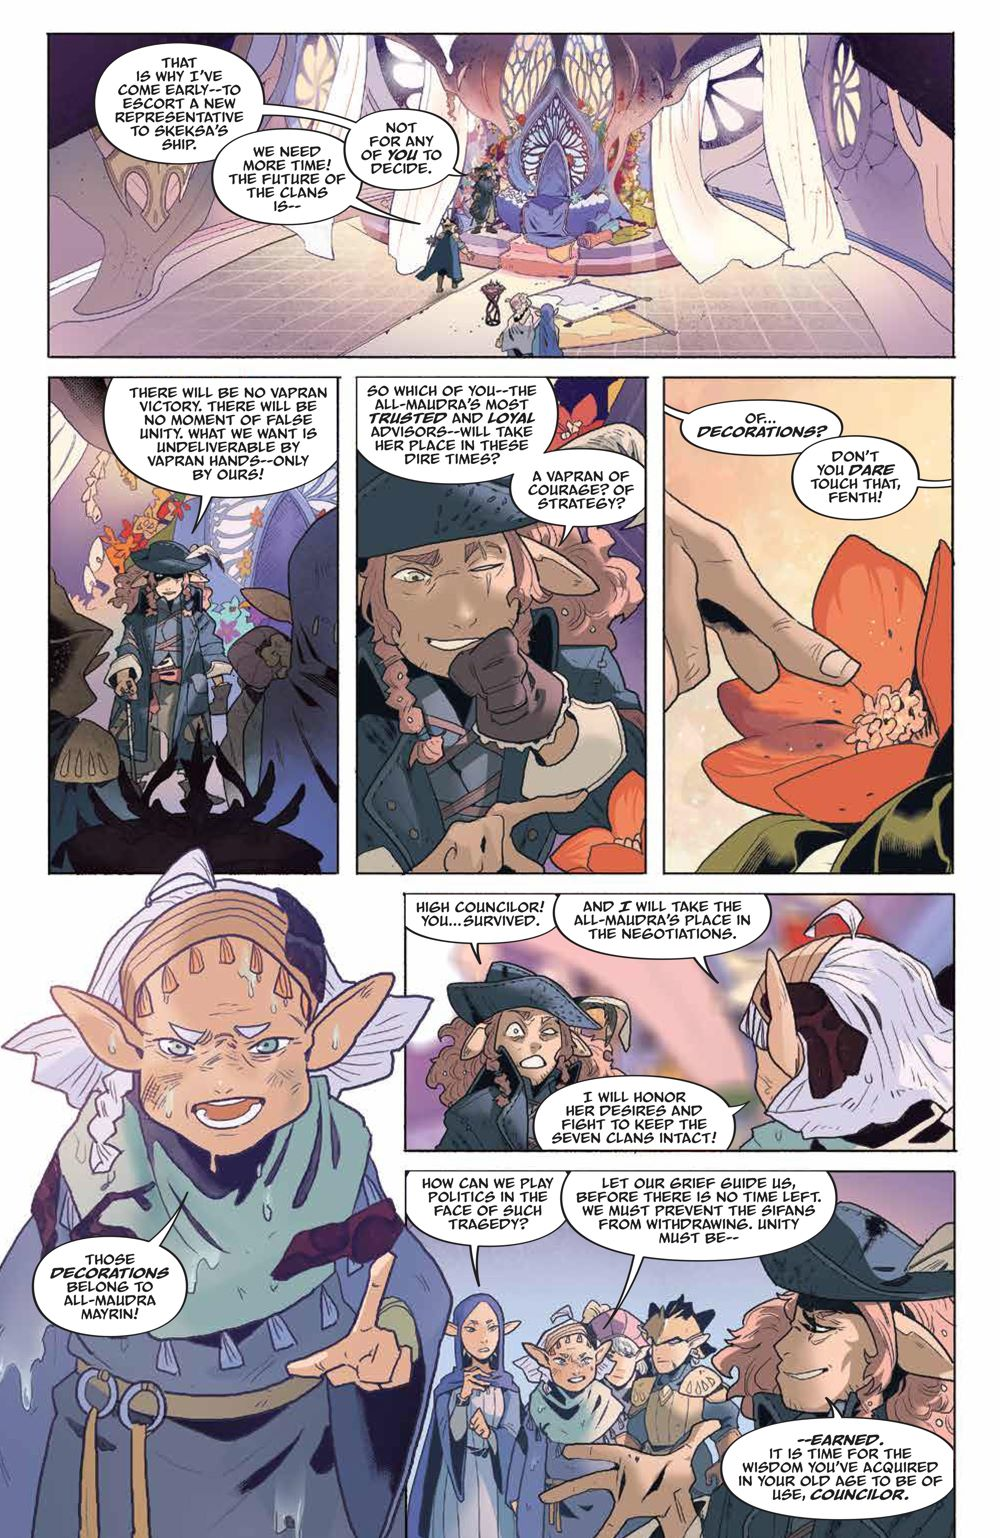 DarkCrystal_AgeResistance_011_PRESS_5 ComicList Previews: JIM HENSON'S THE DARK CRYSTAL AGE OF RESISTANCE #11